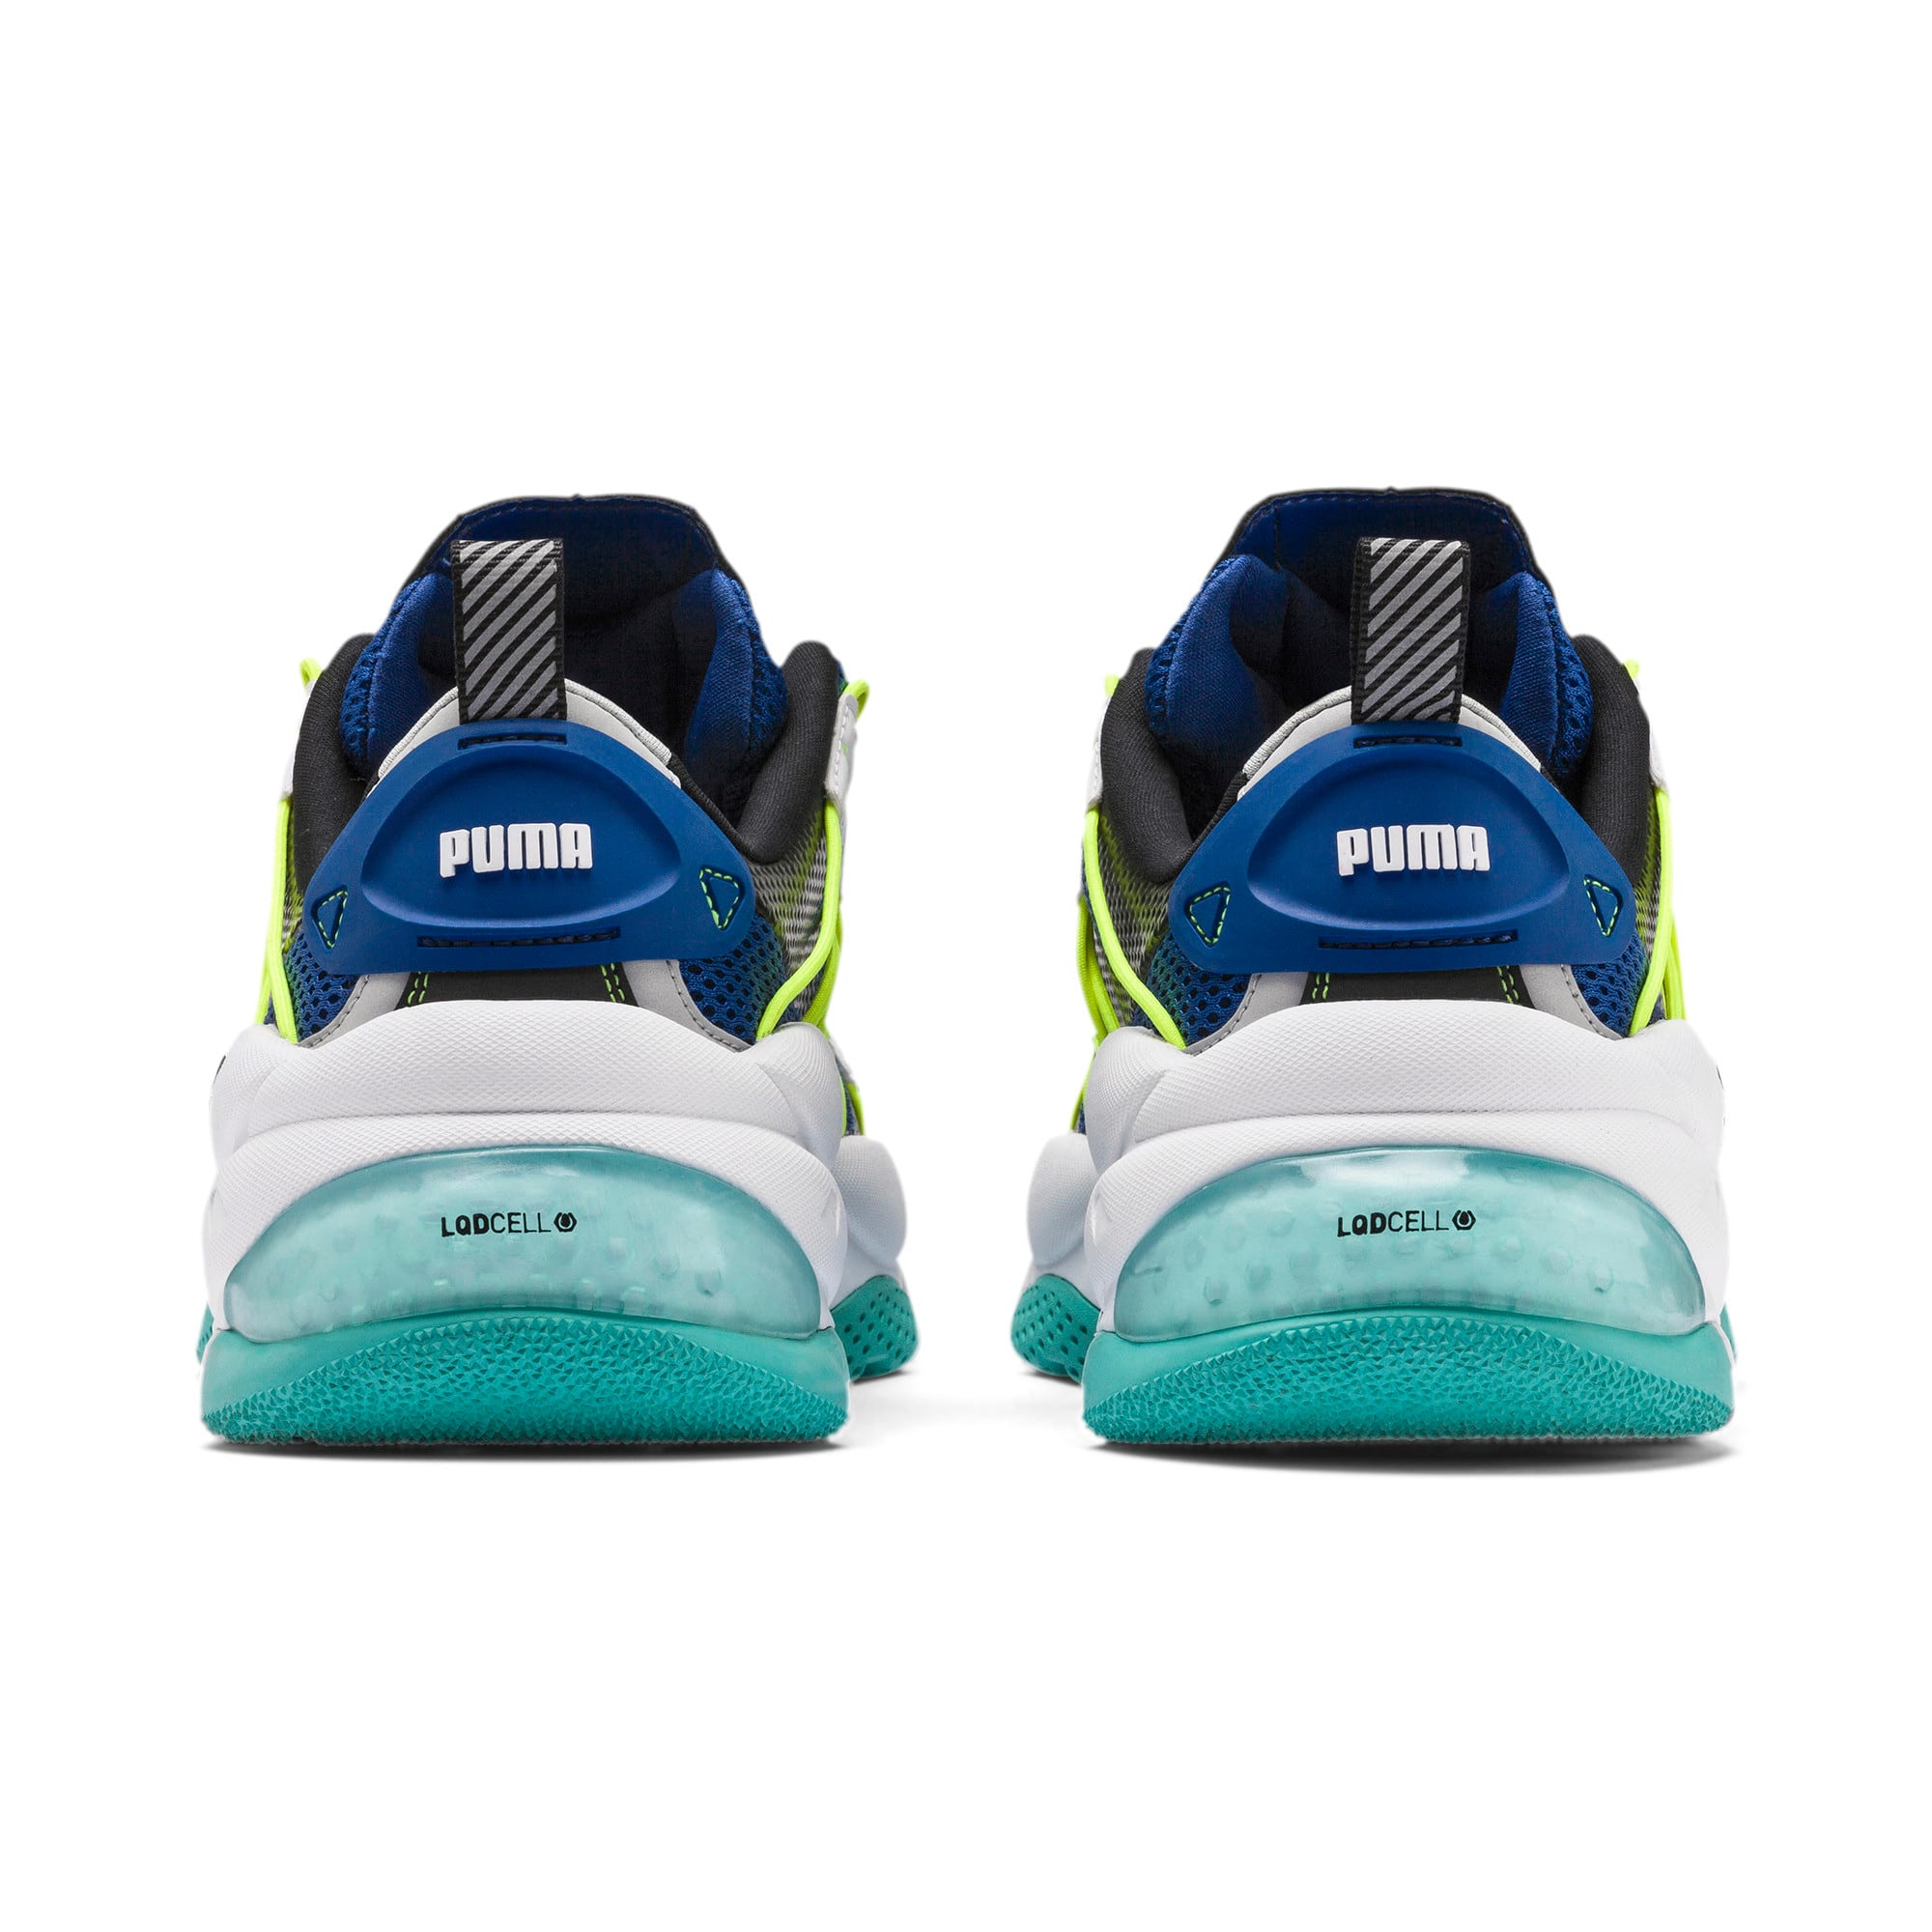 Thumbnail 3 of LQDCELL Omega Training Shoes, Puma Black-Galaxy Blue, medium